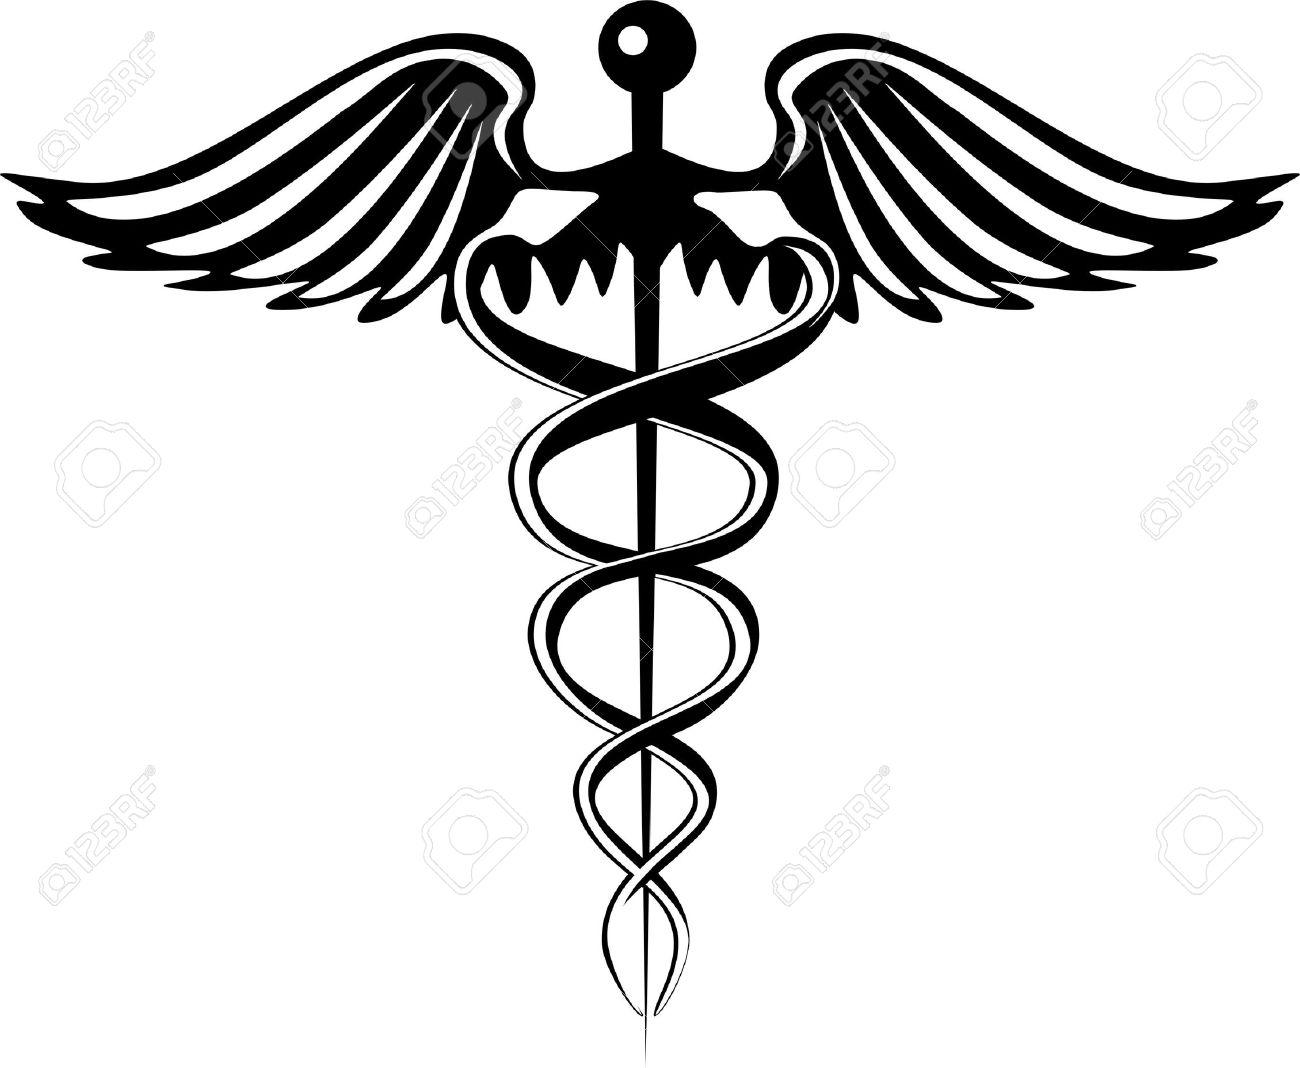 Nurse practitioner symbol nurse practitioner symbol biocorpaavc